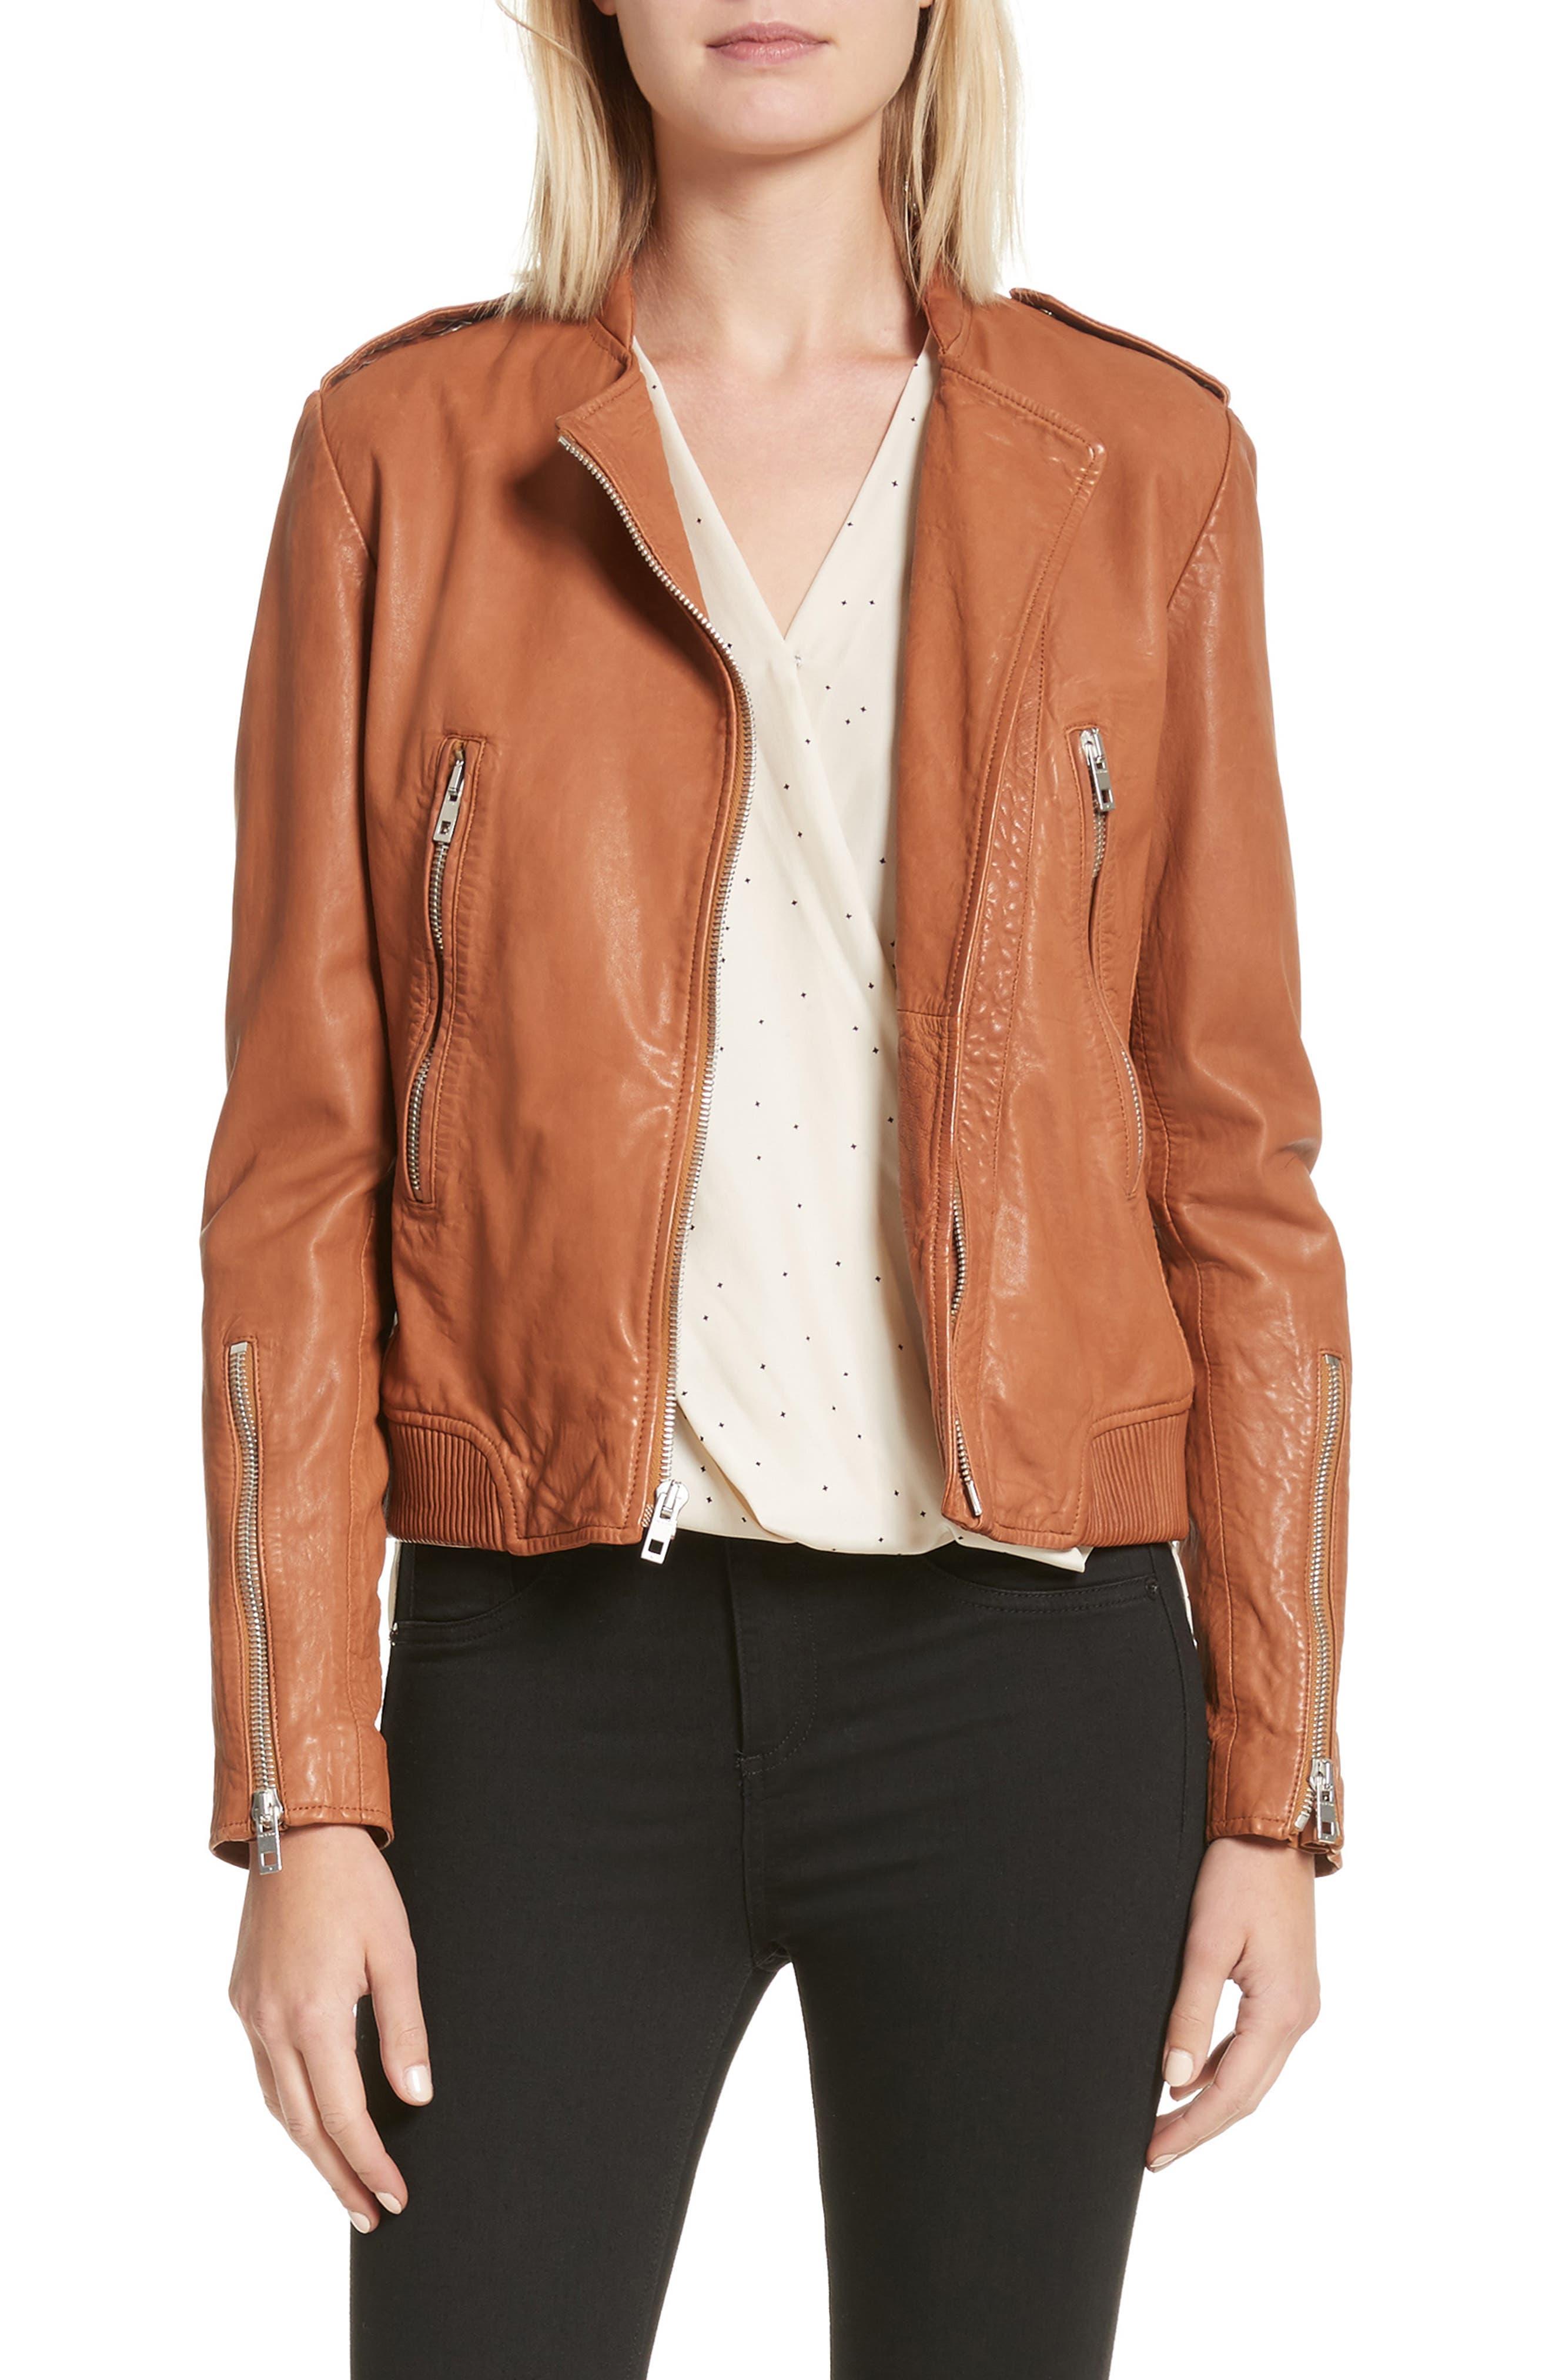 Lyon Leather Jacket,                             Main thumbnail 1, color,                             200